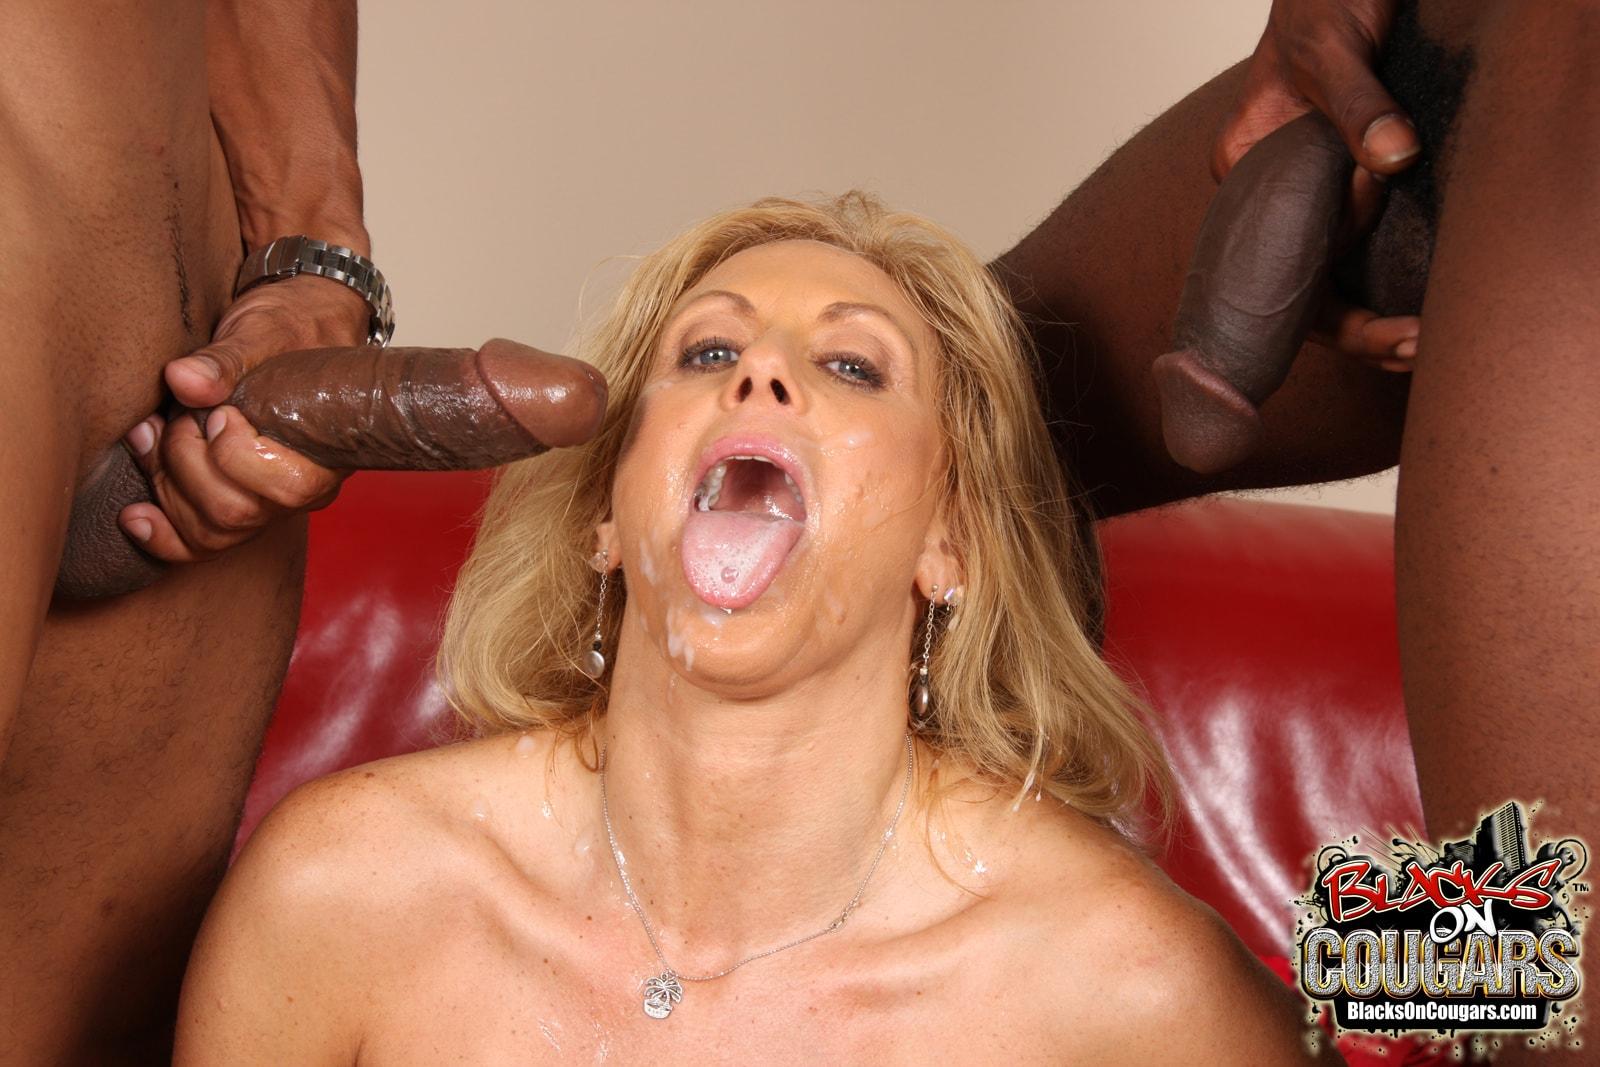 Dogfart '- Blacks On Cougars' starring Dana Devine (Photo 29)